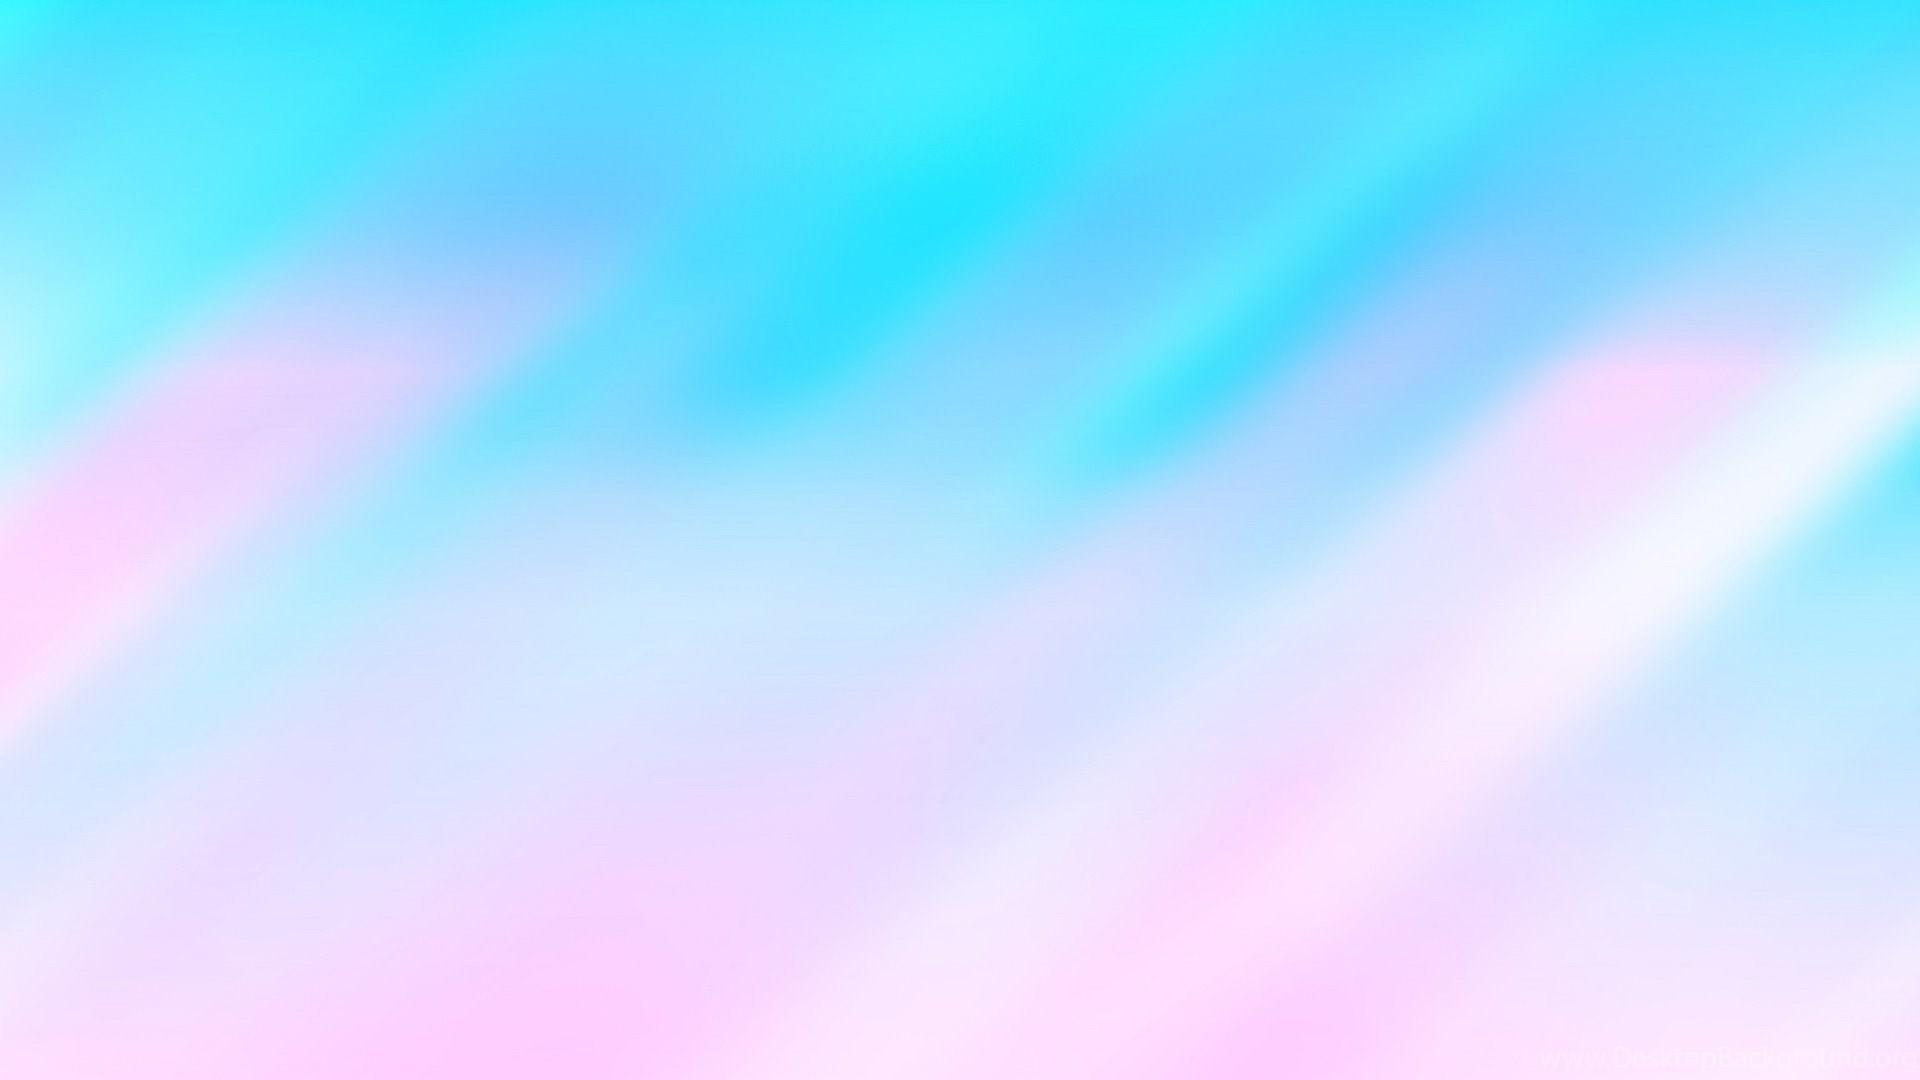 Pastel Wallpaper Ipod Wallpaper Wallpaper Backgrounds